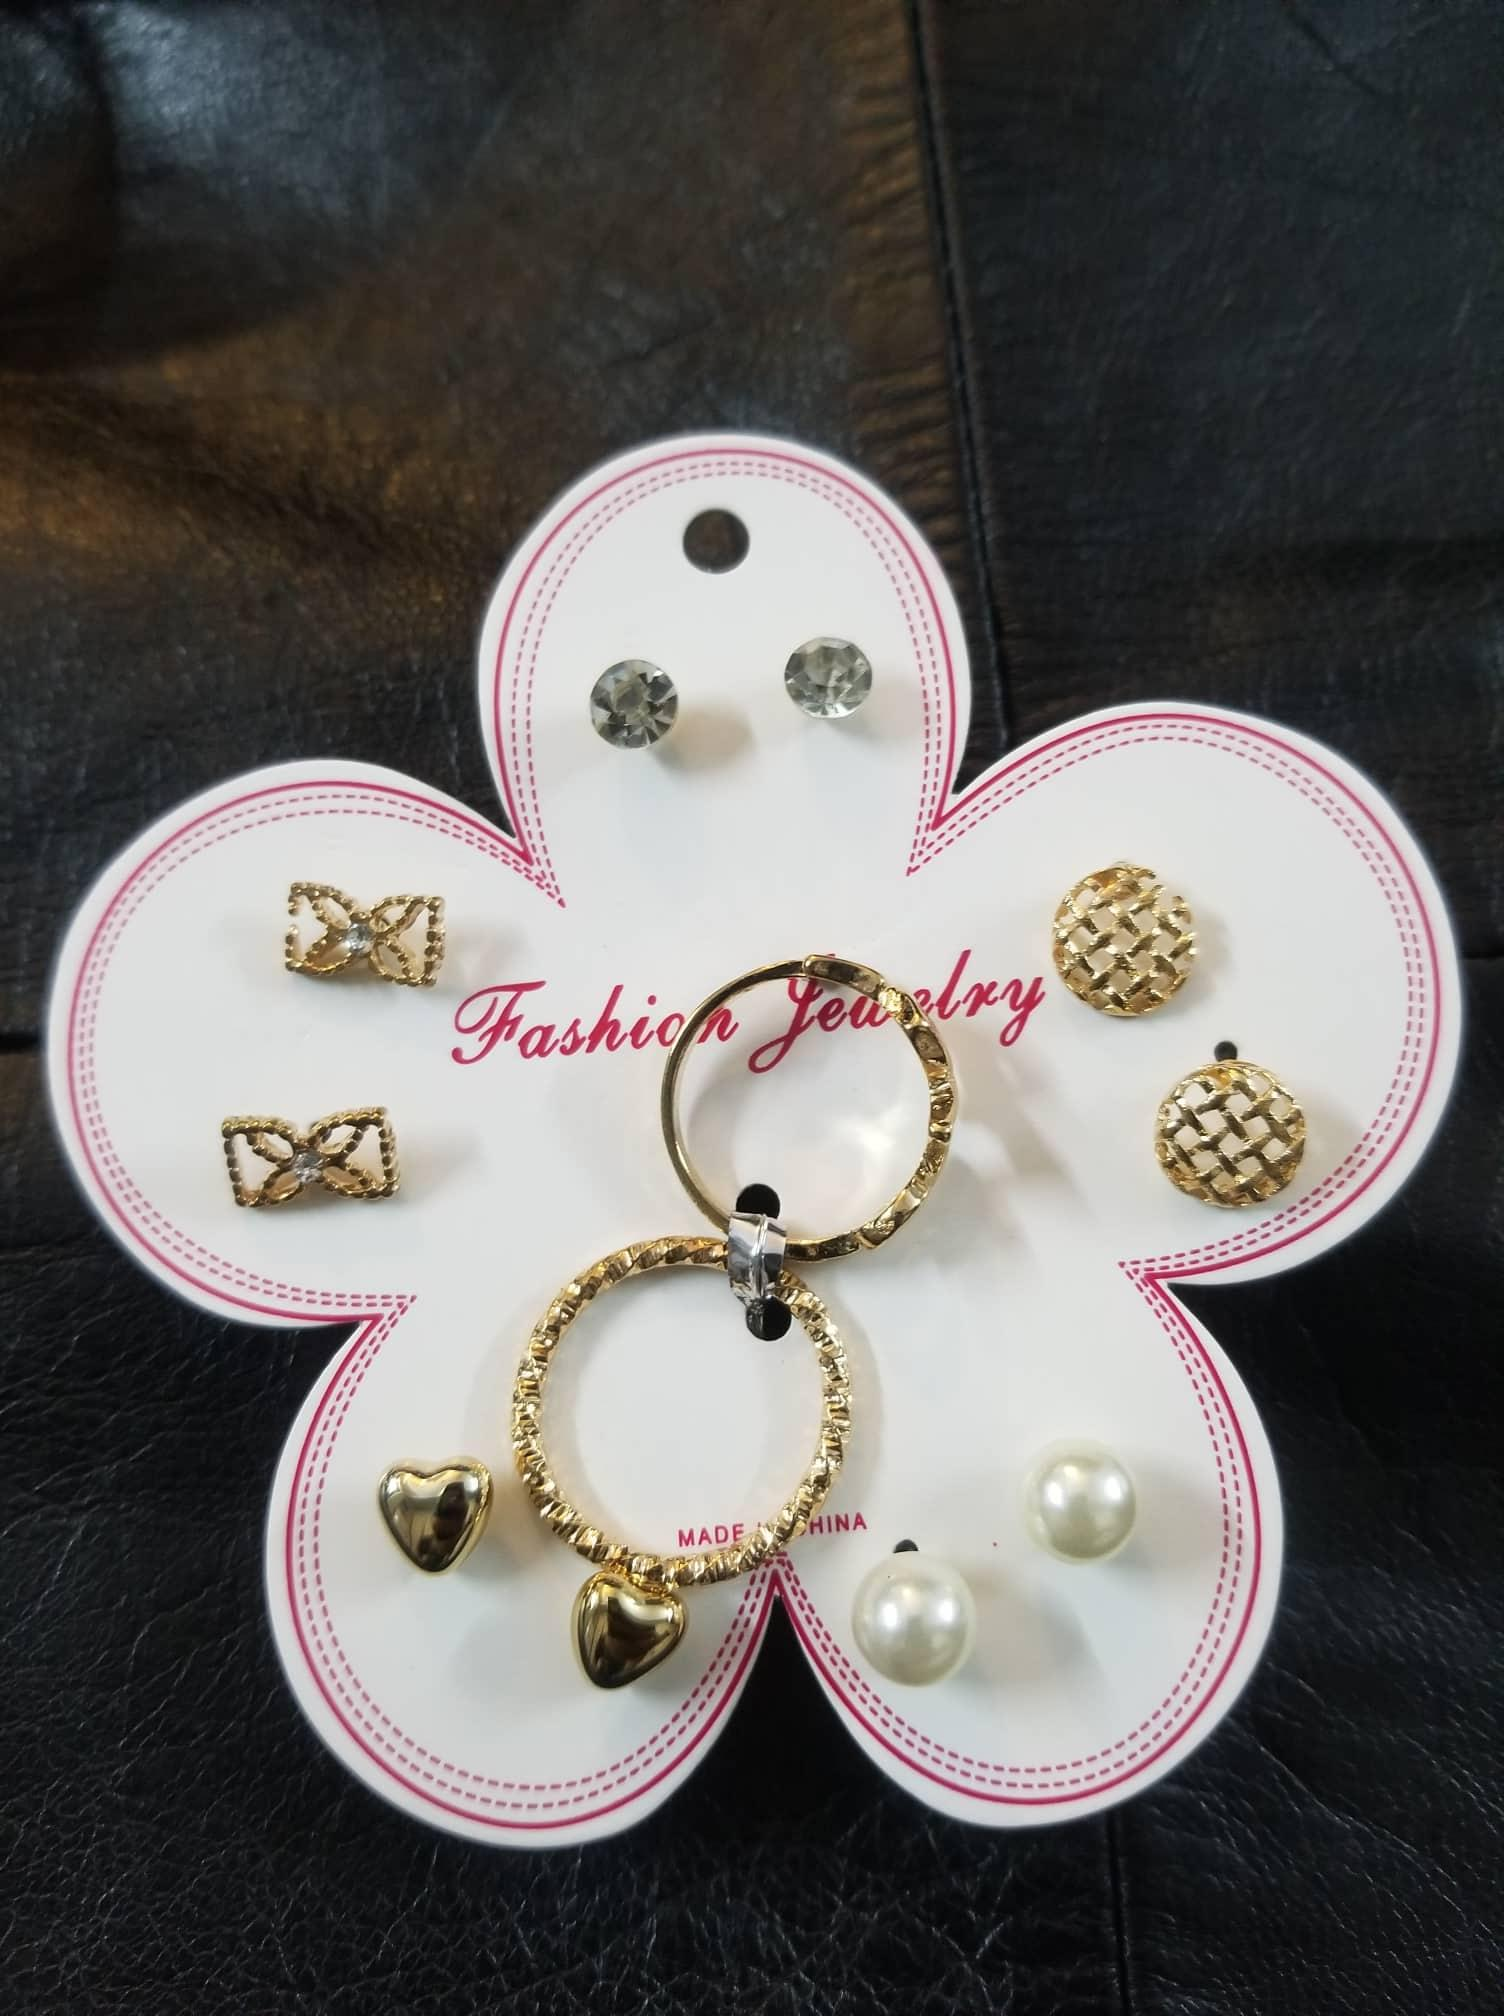 993fc18d5 Girls Multiple Earring And Ring Jewellery Set Trendy Fashion Women Earrings  - Pack of 7